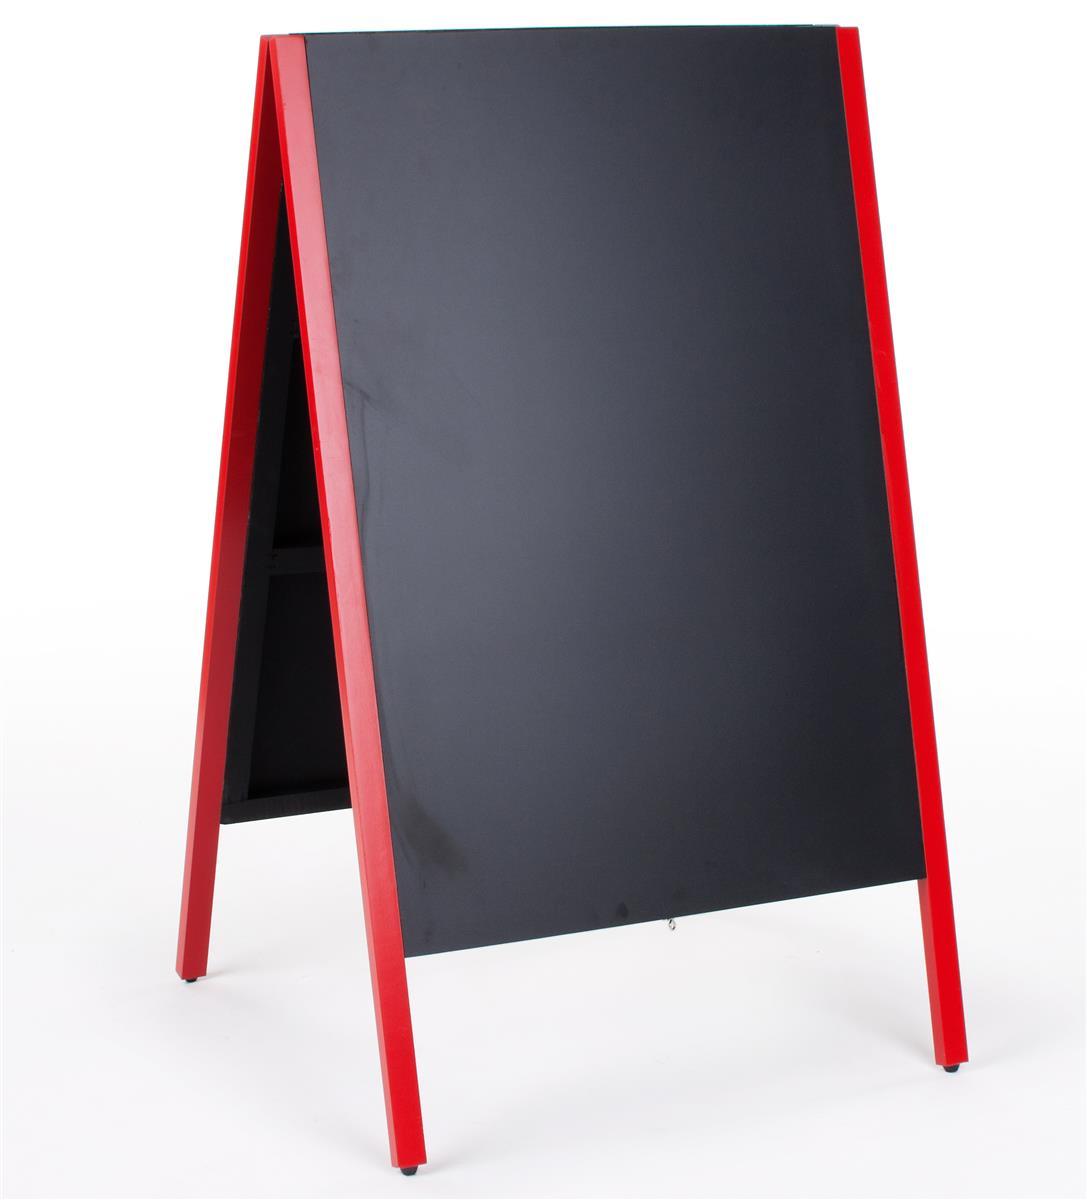 Displays2go 24 x 36 Chalkboard Sidewalk Sign, Double-Sided, Wooden A-Frame